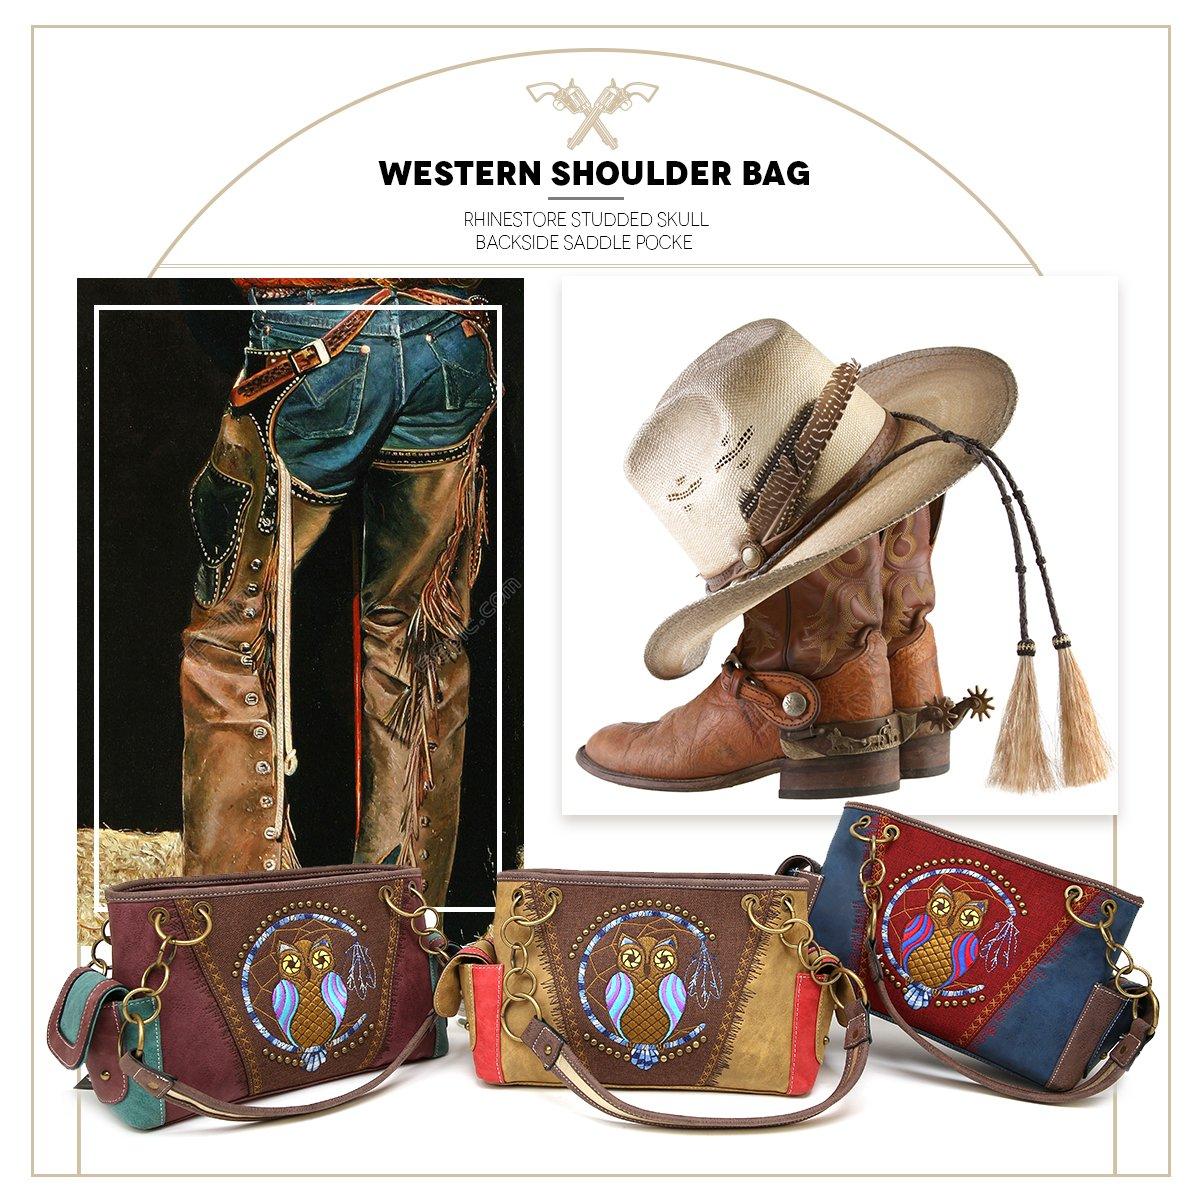 6703b568c75 Amazon.com  Western Owl Handbag Purses Tote Bag Shoulder Bag Rhinestone and  Studded with Back Side Concealed Saddle Pocket for Cowgirl (light camel)   Shoes